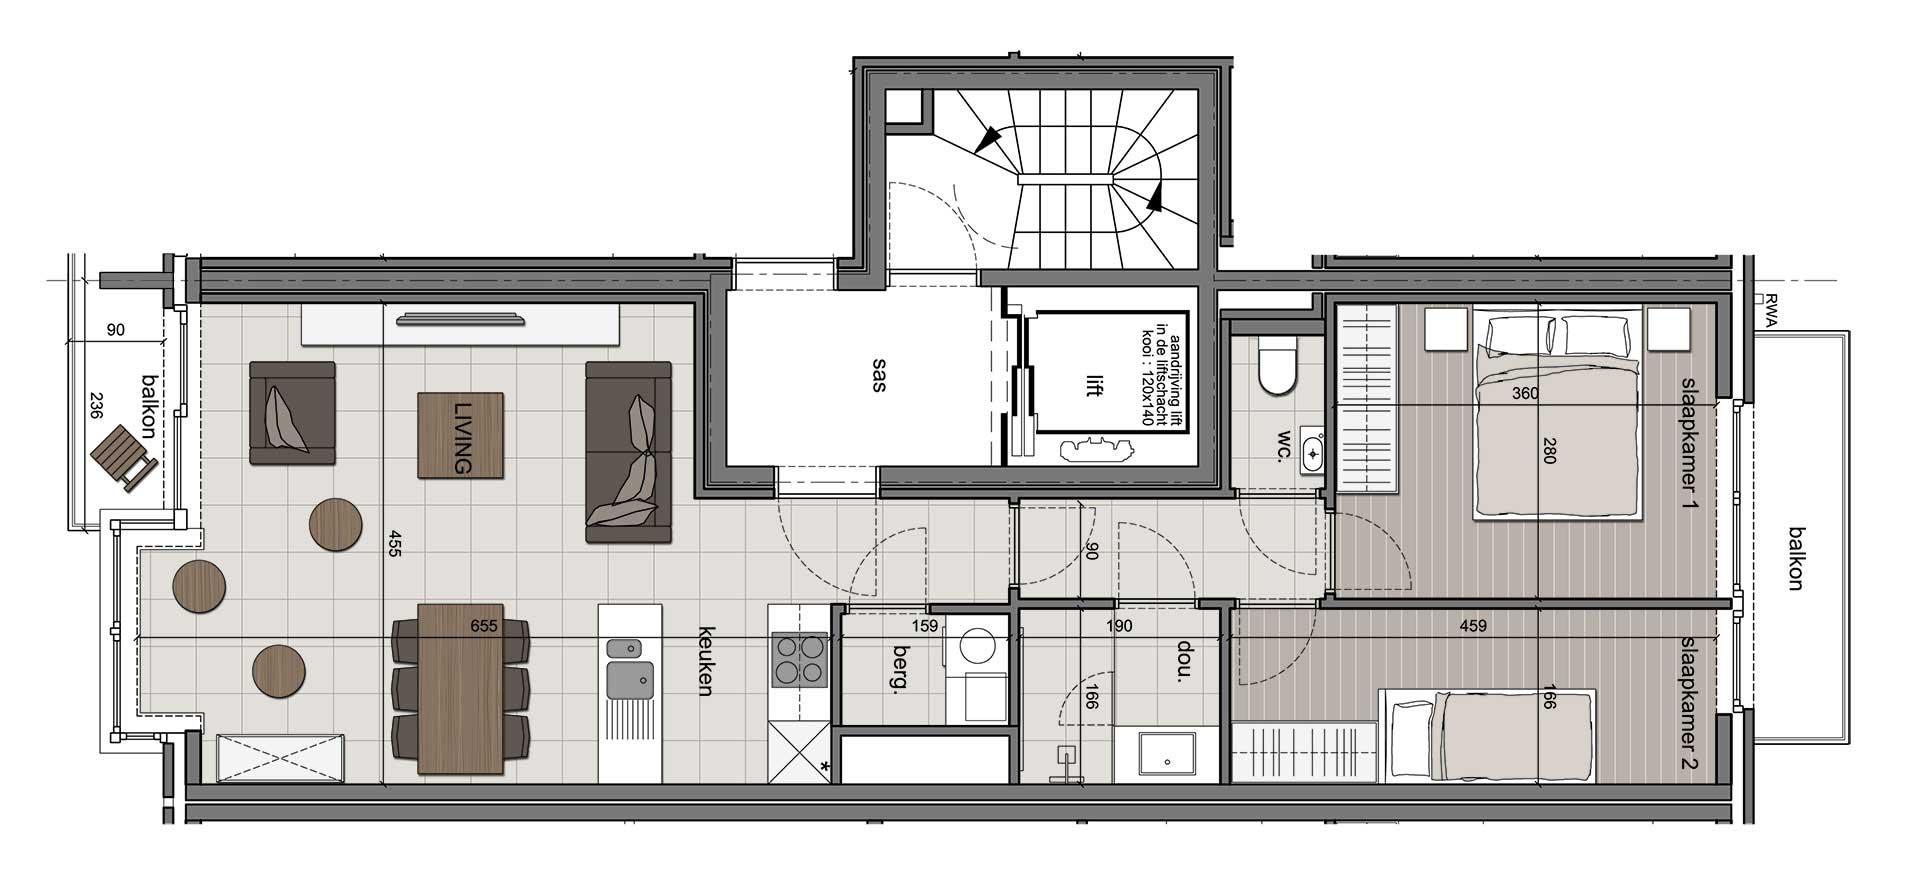 Residentie <br /> Winoc - image appartement-te-koop-koksijde-residentie-winoc-3.2-4.2 on https://hoprom.be